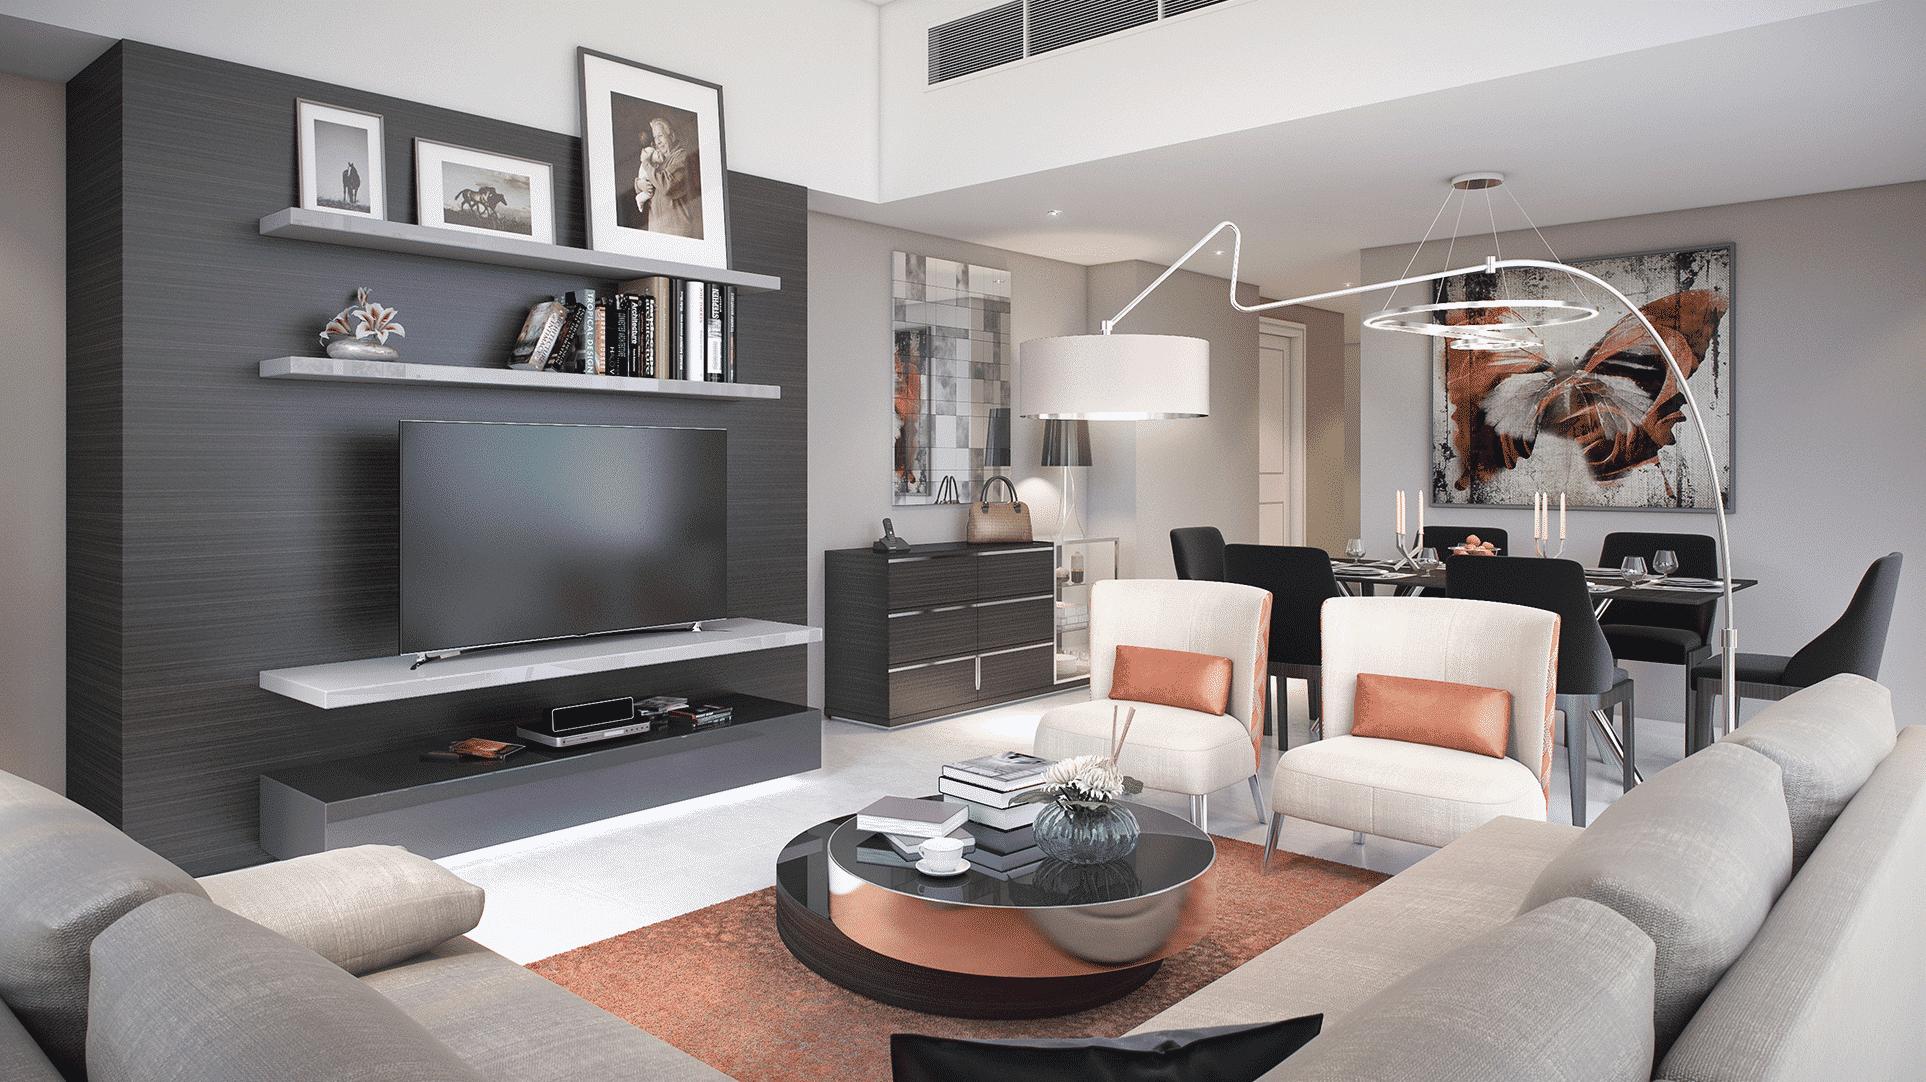 Bellavista by Damac at DAMAC Hills. Luxury apartments for Sale in Dubai 233